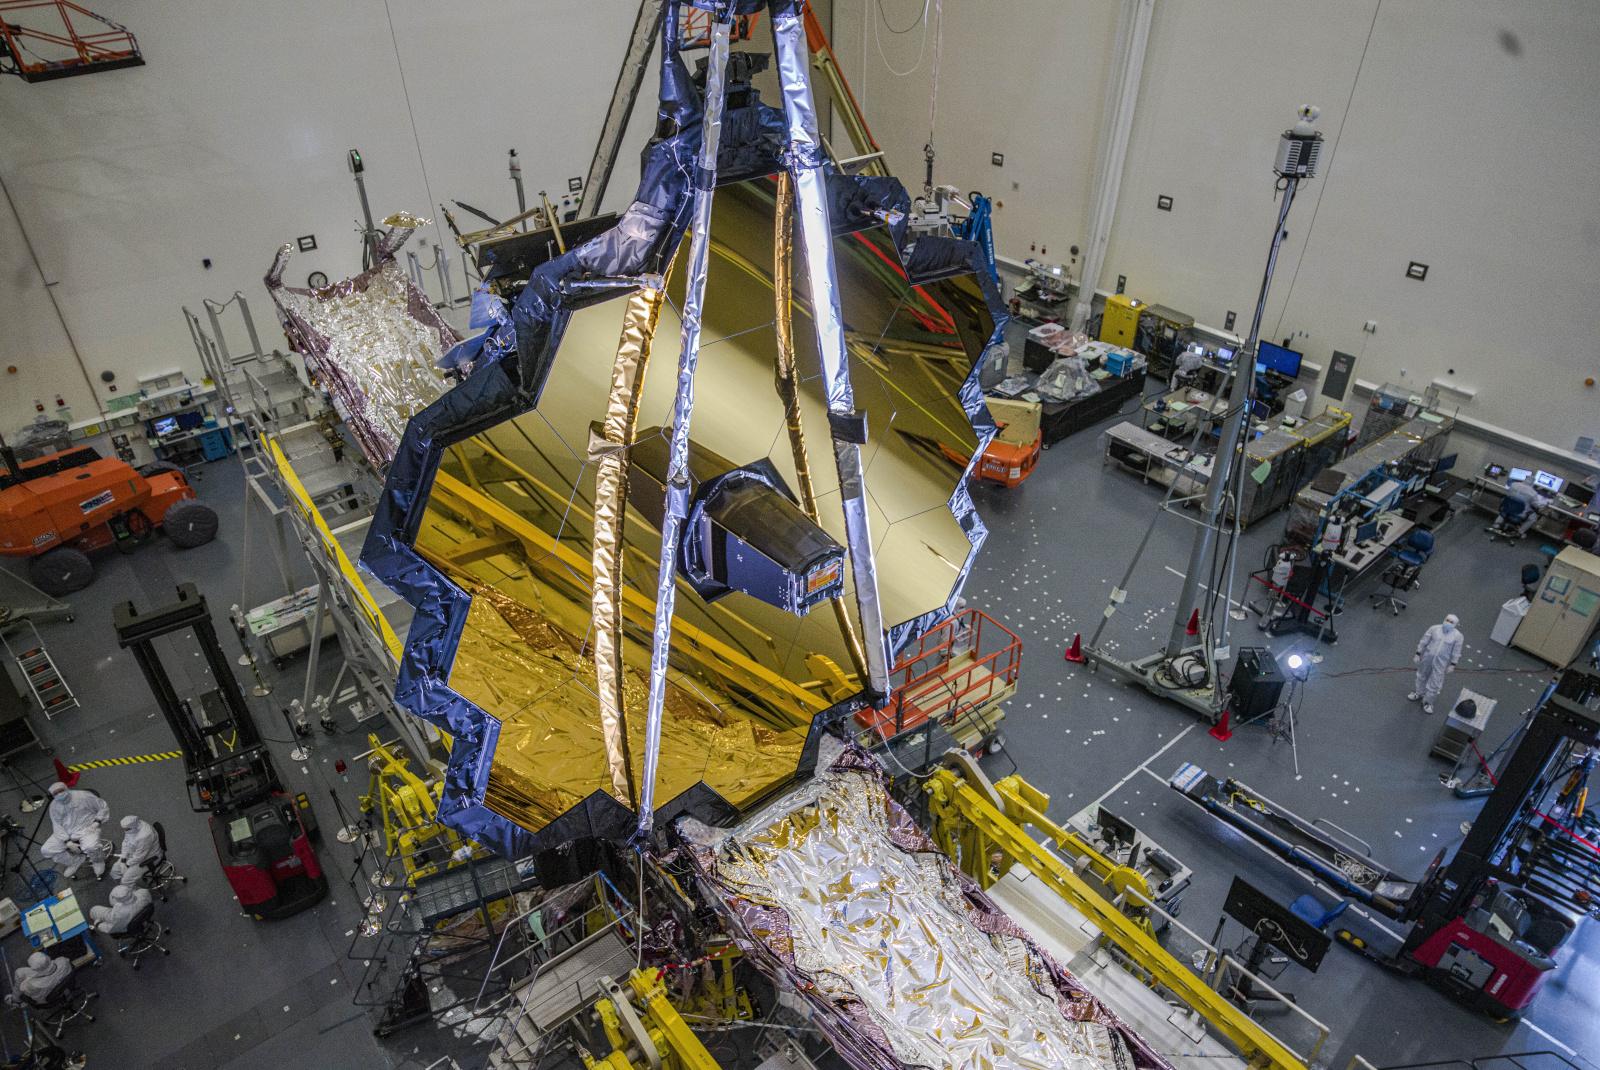 NASA delays James Webb Space Telescope launch until October 2021   Engadget